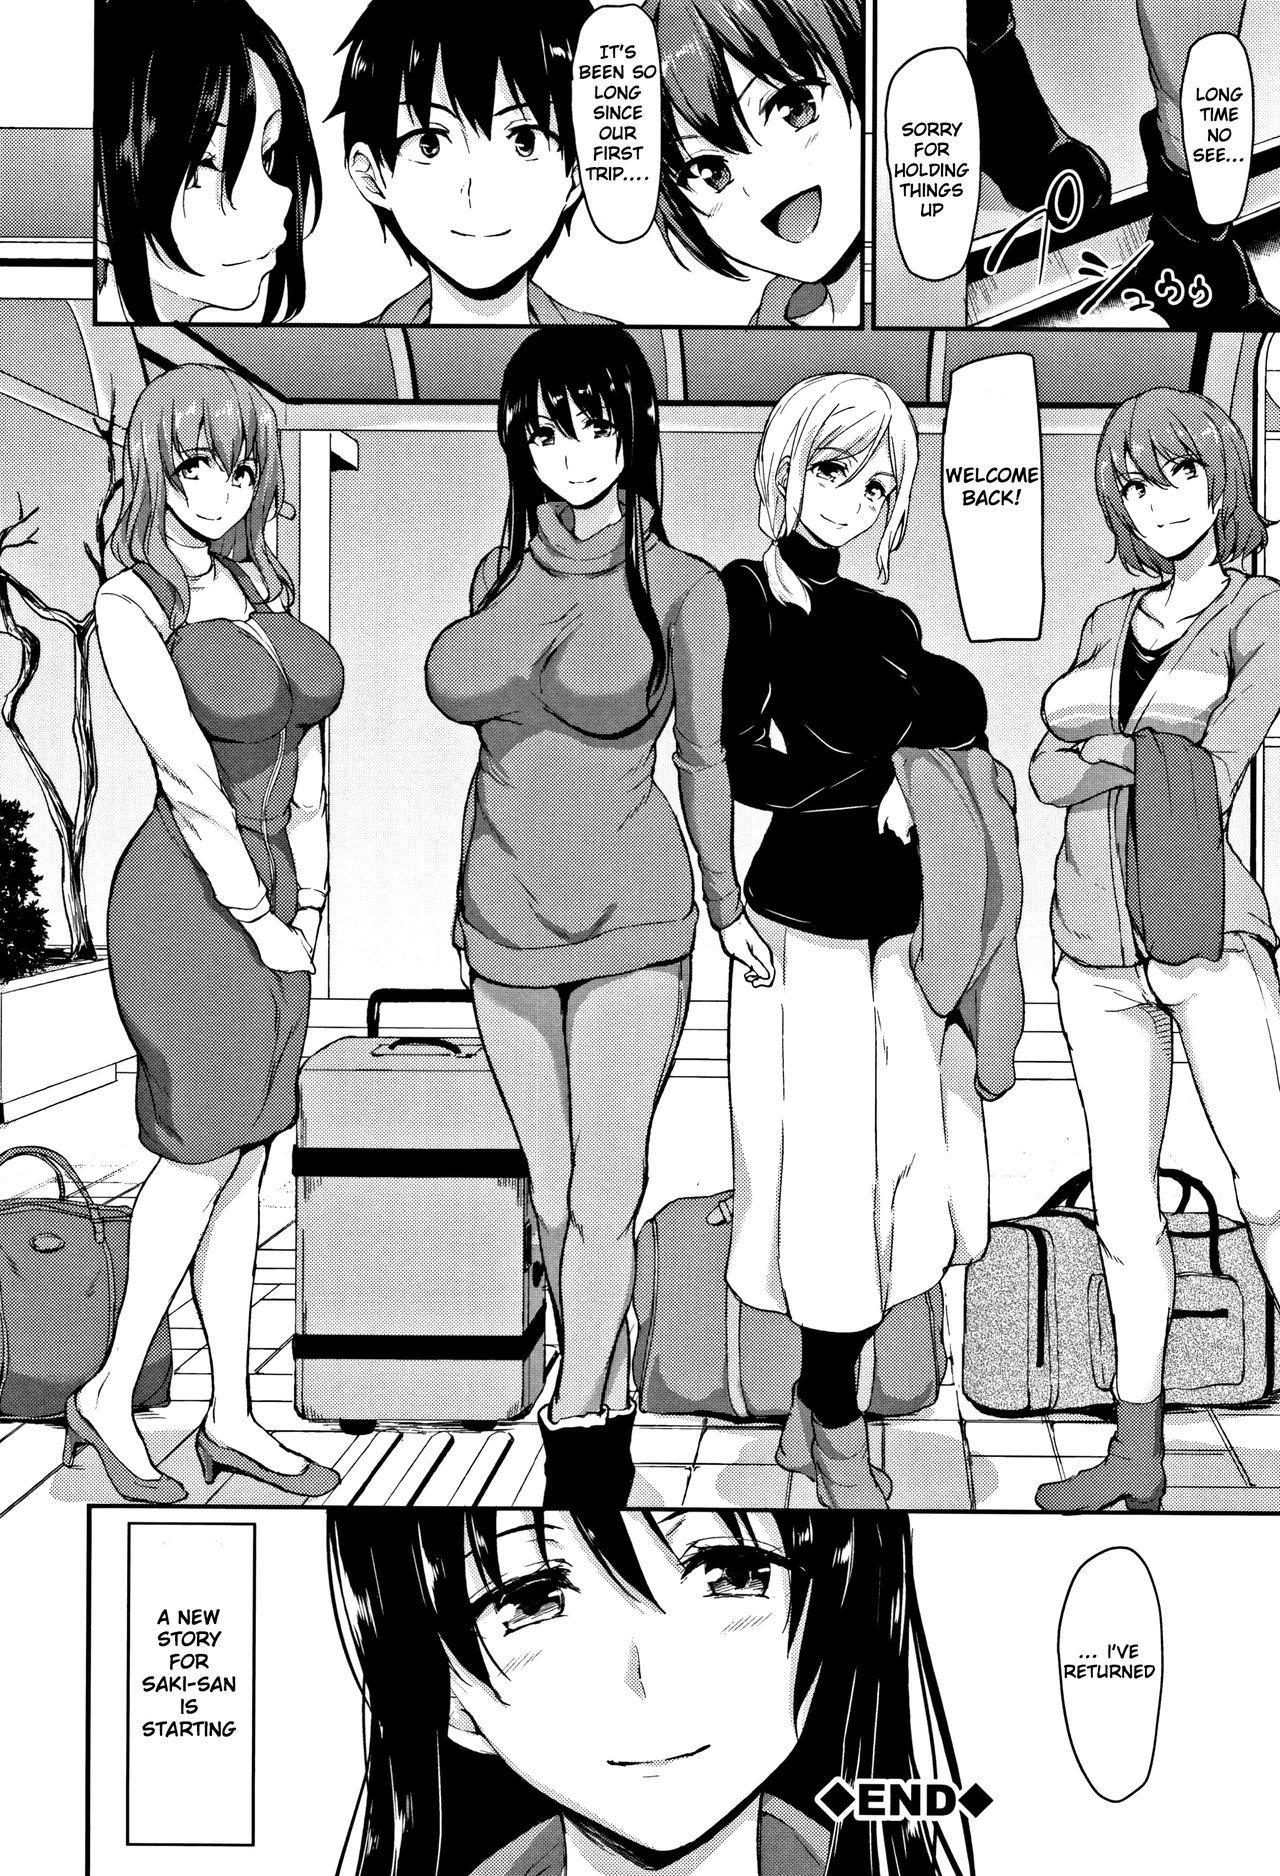 Yukemuri Harem Monogatari Saishuuwa | Yukemuri Harem Monogatari Final Chapter 37